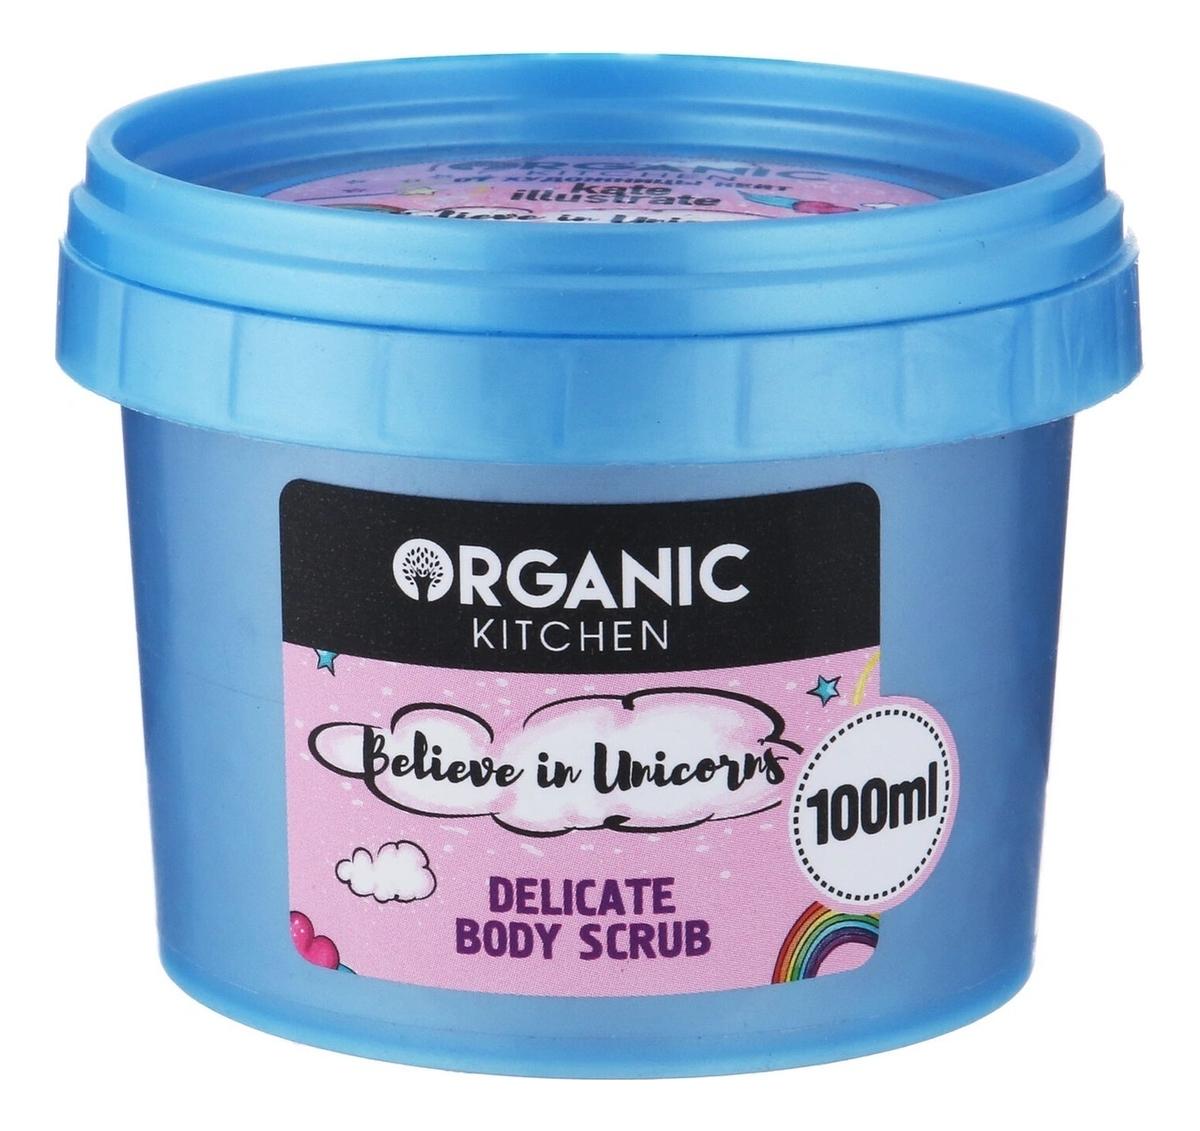 Нежный скраб для тела от художницы @kateillustrate Organic Kitchen Delicate Body Scrub 100мл недорого